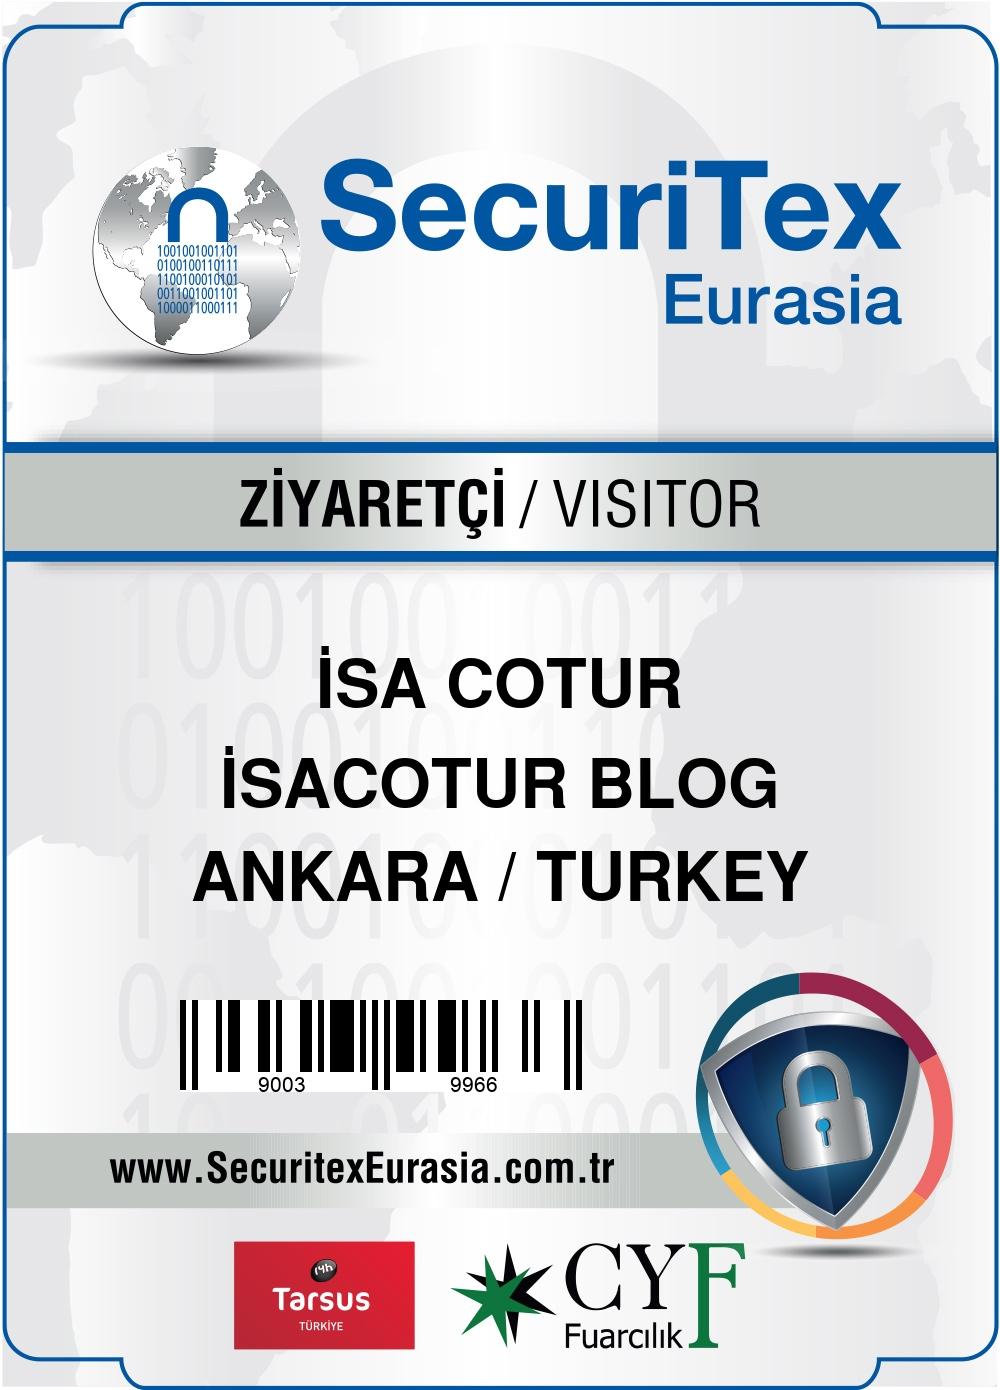 SecuriTex Eurasia 2019 Ankara Ziyaretçi kartı